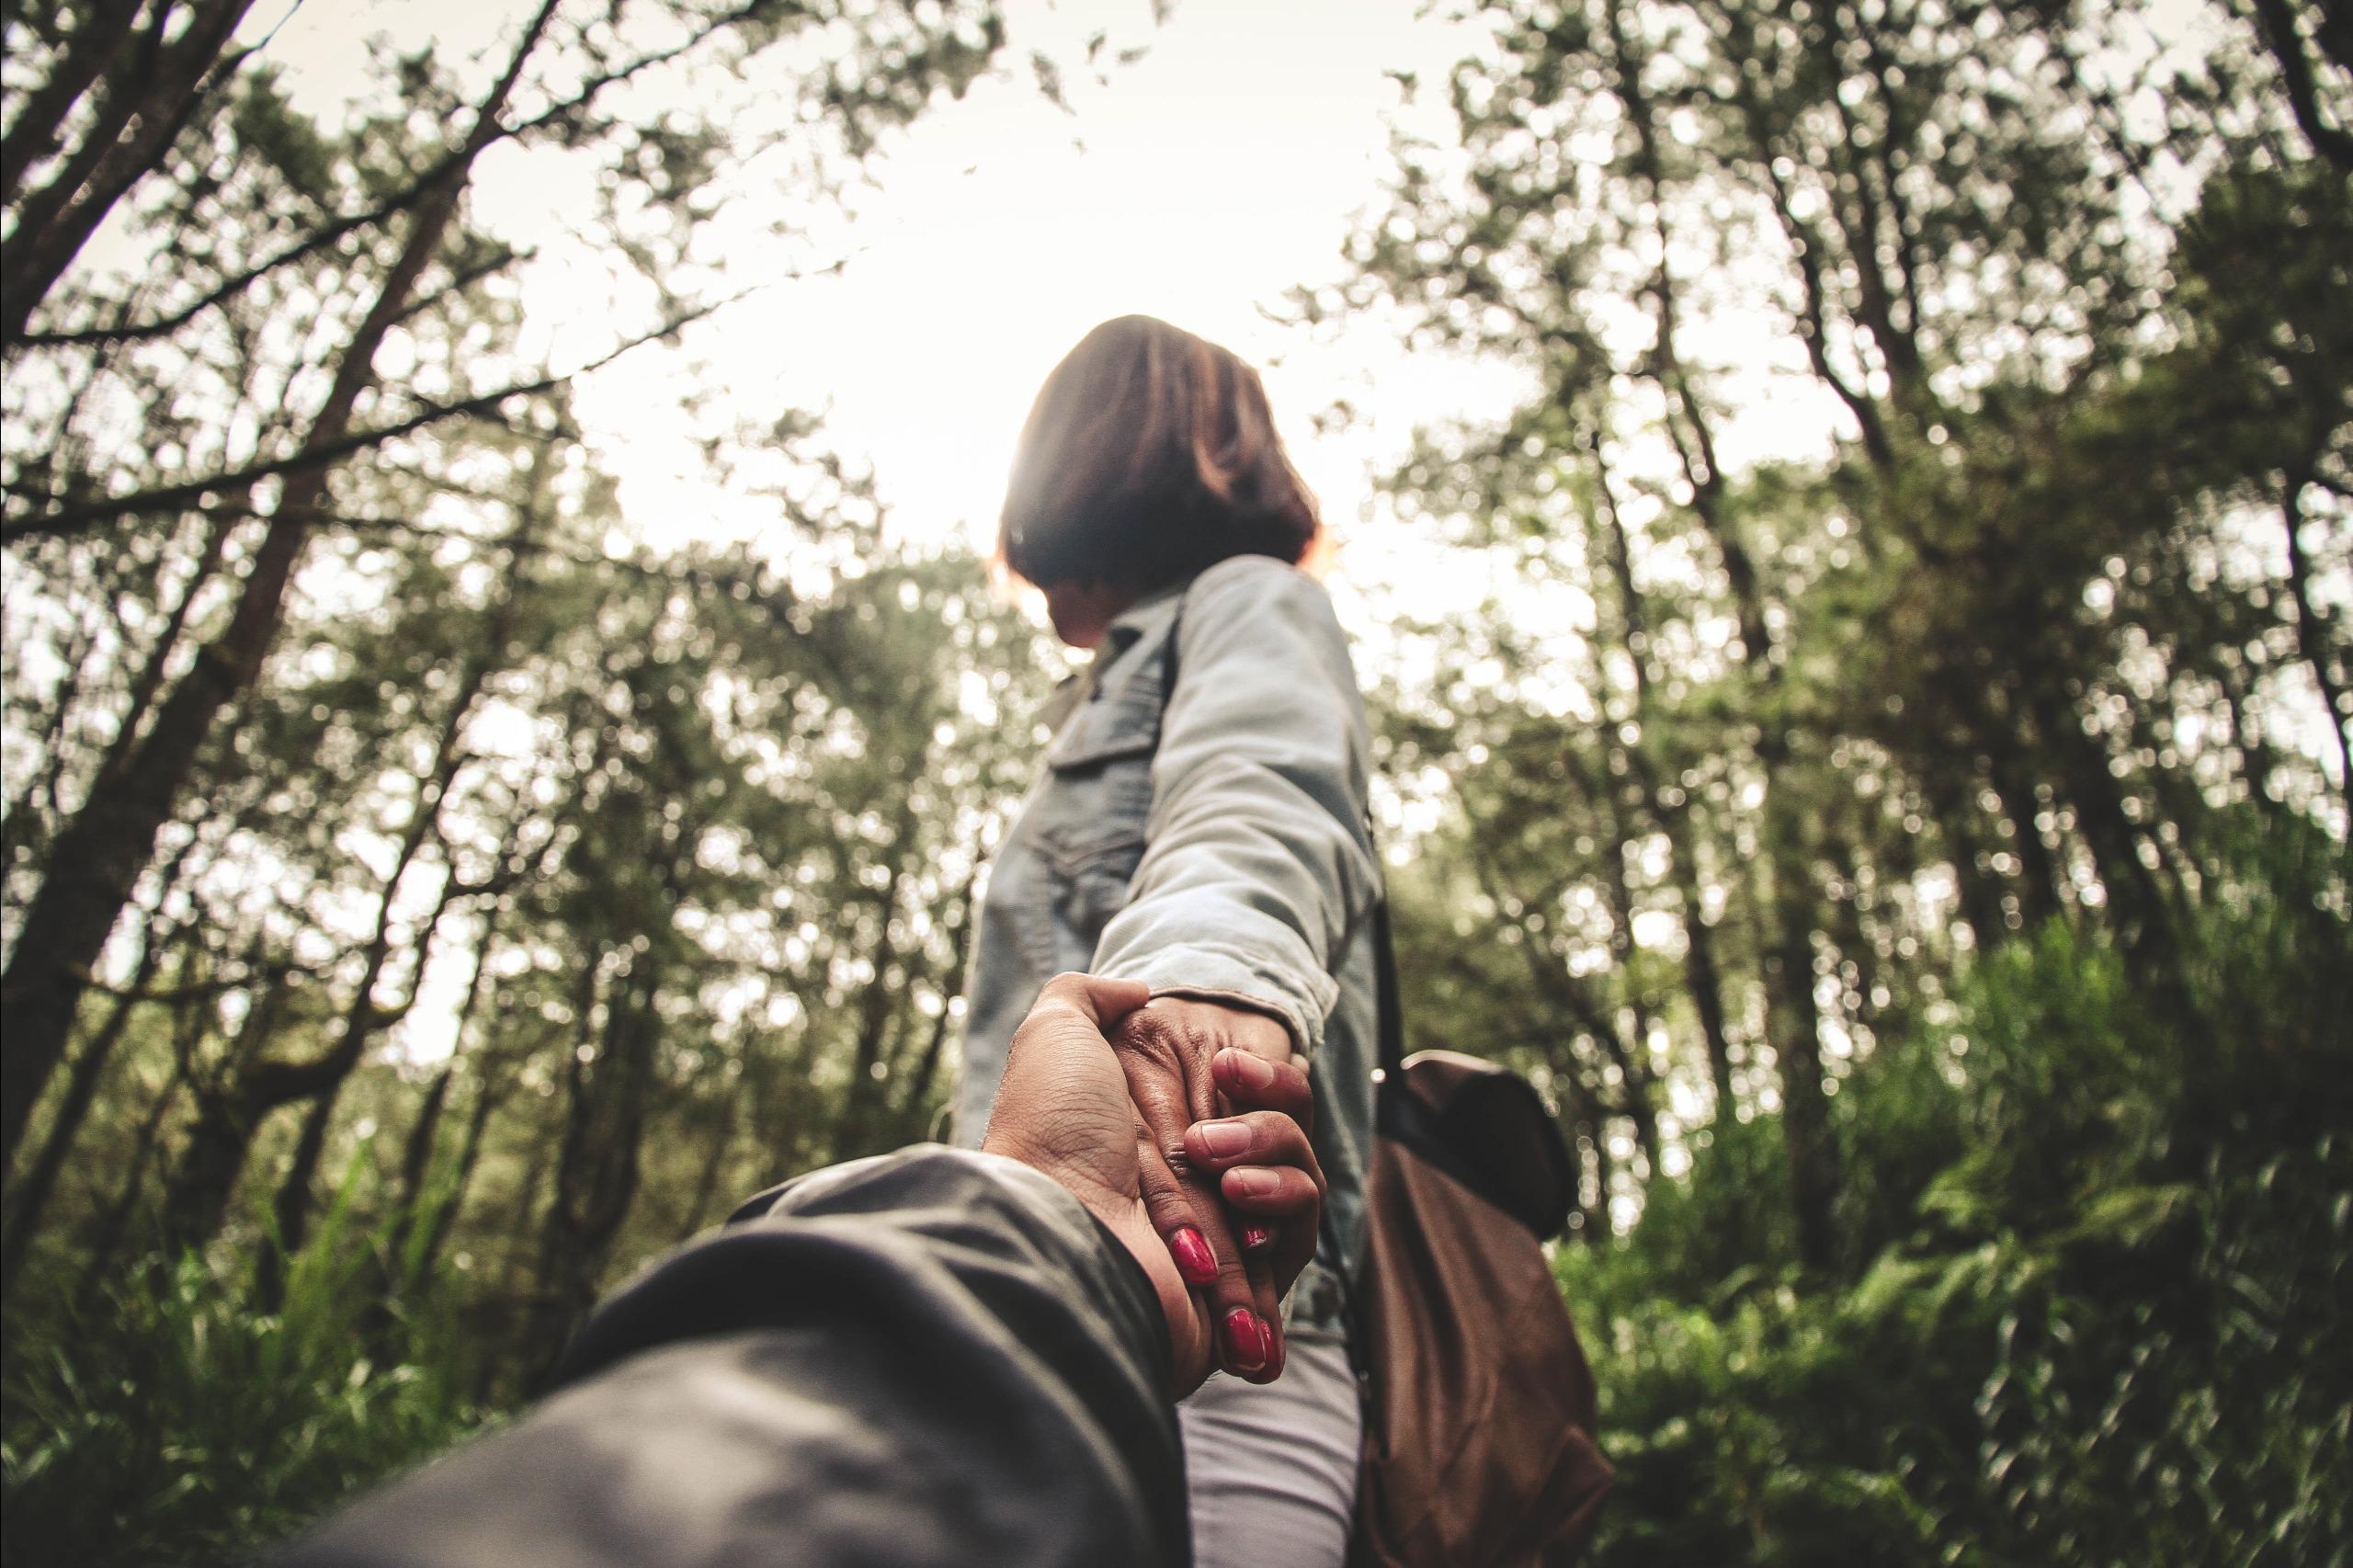 #FreeToEdit #love #couple #mydate #nature #forest